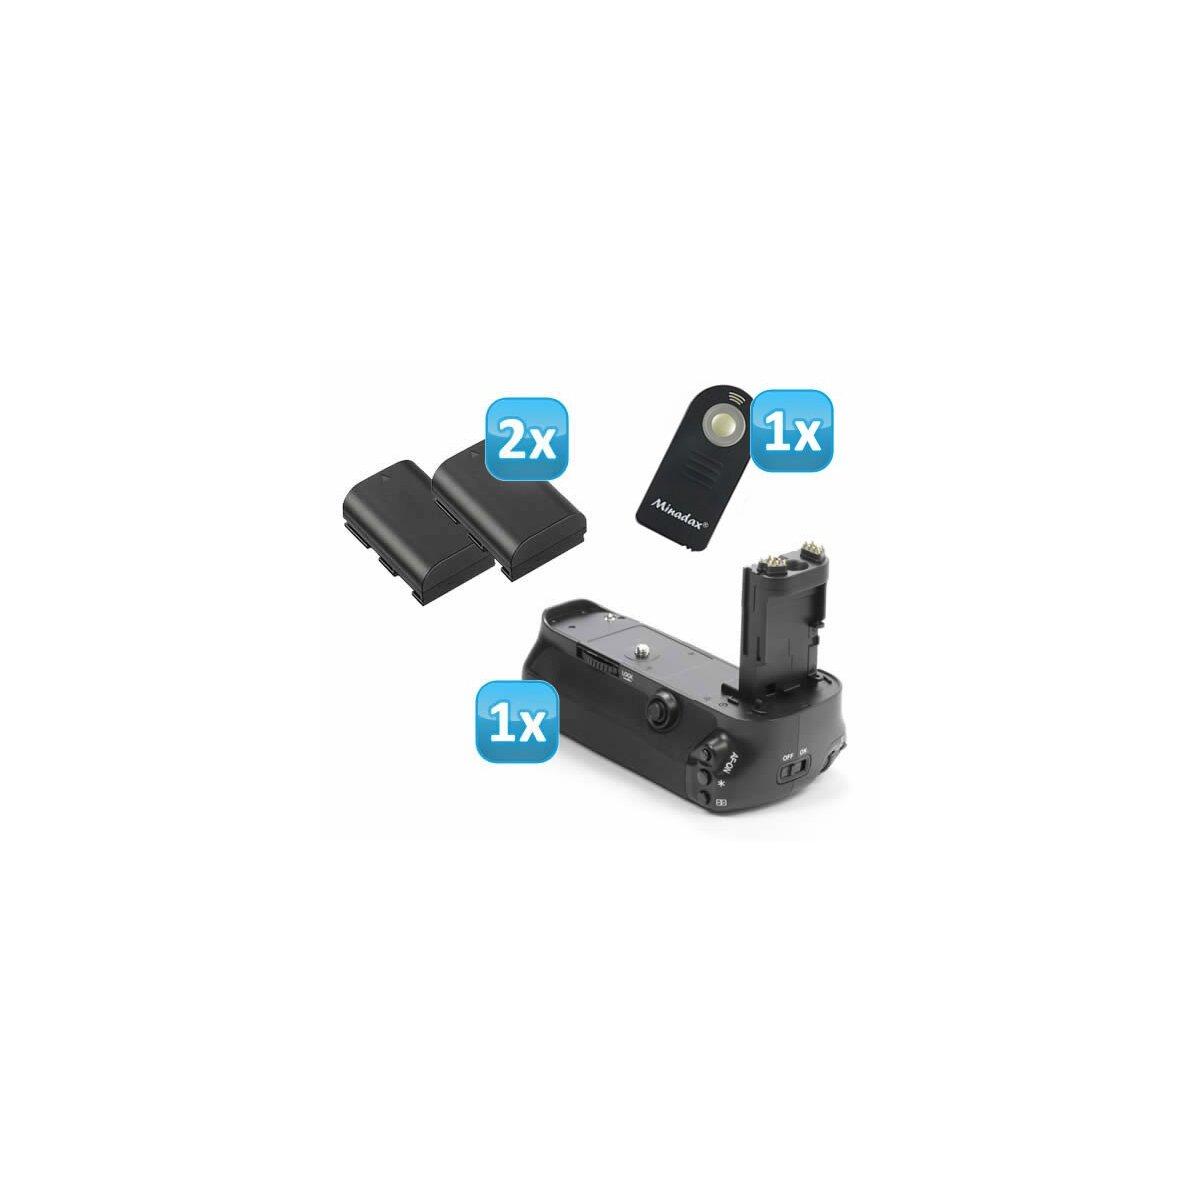 Minadax Profi Batteriegriff fuer Canon EOS 5D Mark III als BG-E11 Ersatz fuer LP-E6 Akkus + 2x LP-E6 Nachbau-Akkus + 1x Infrarot Fernbedienung!